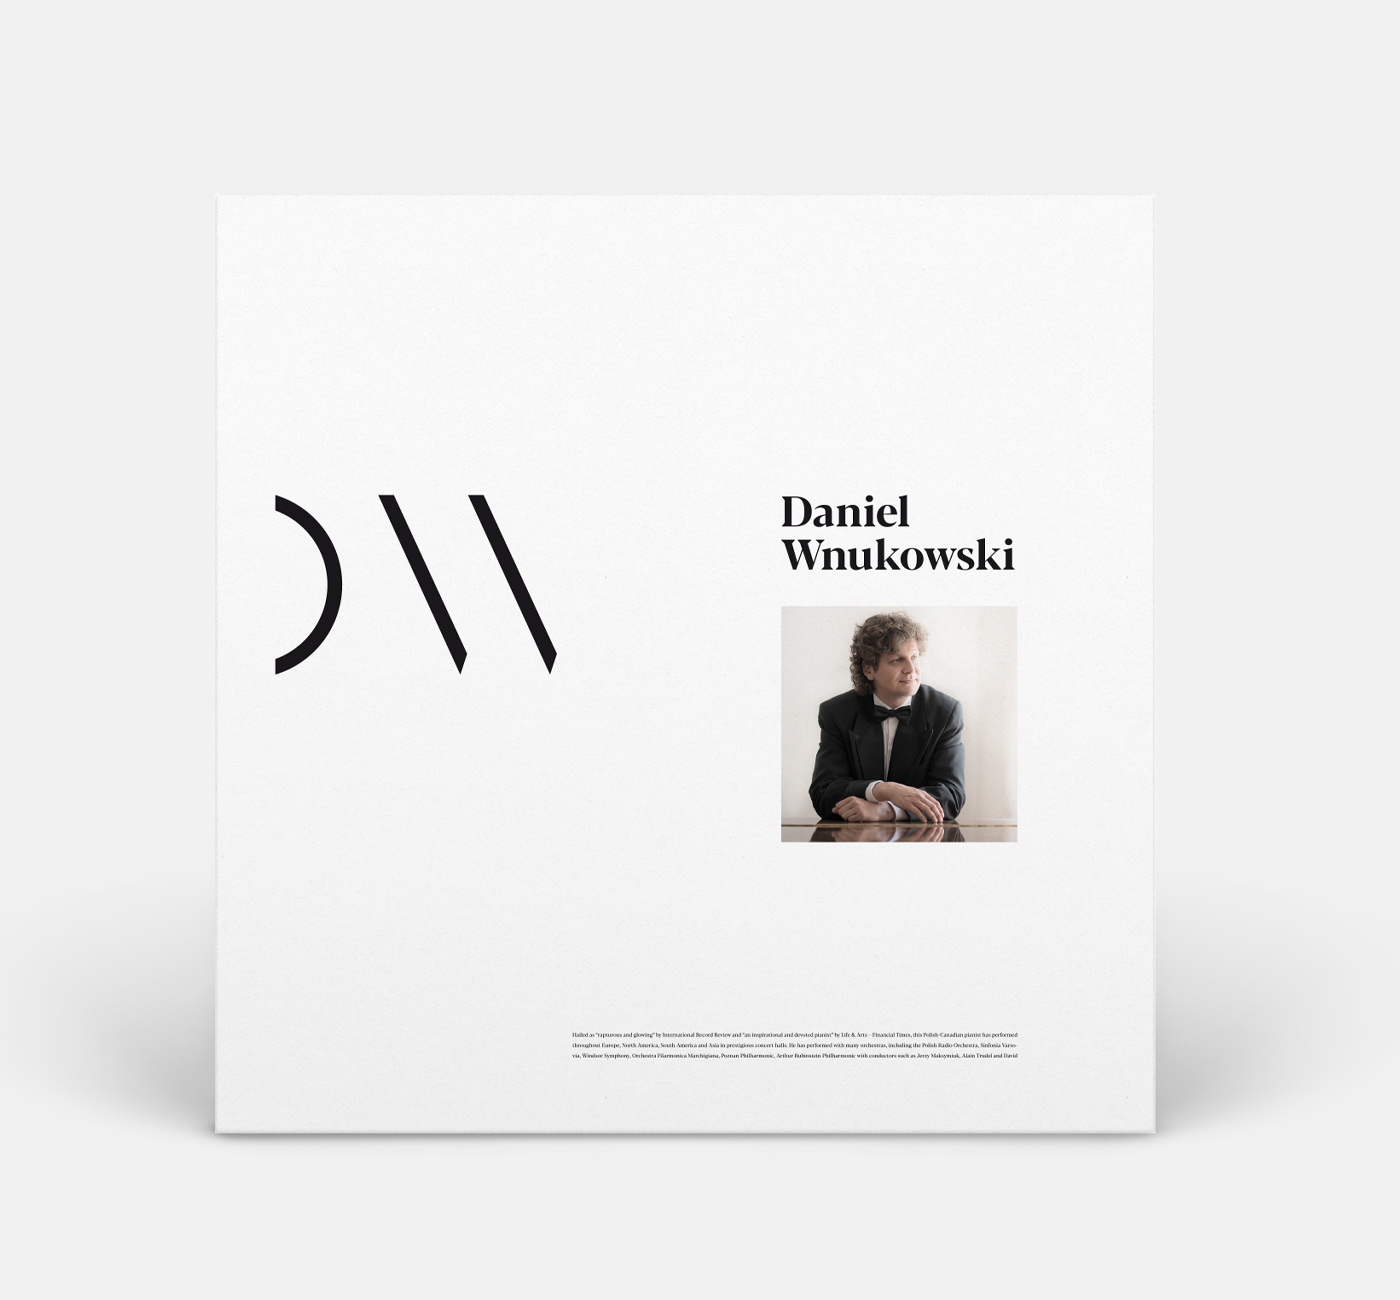 Daniel-Wnukowski-vinyl-1